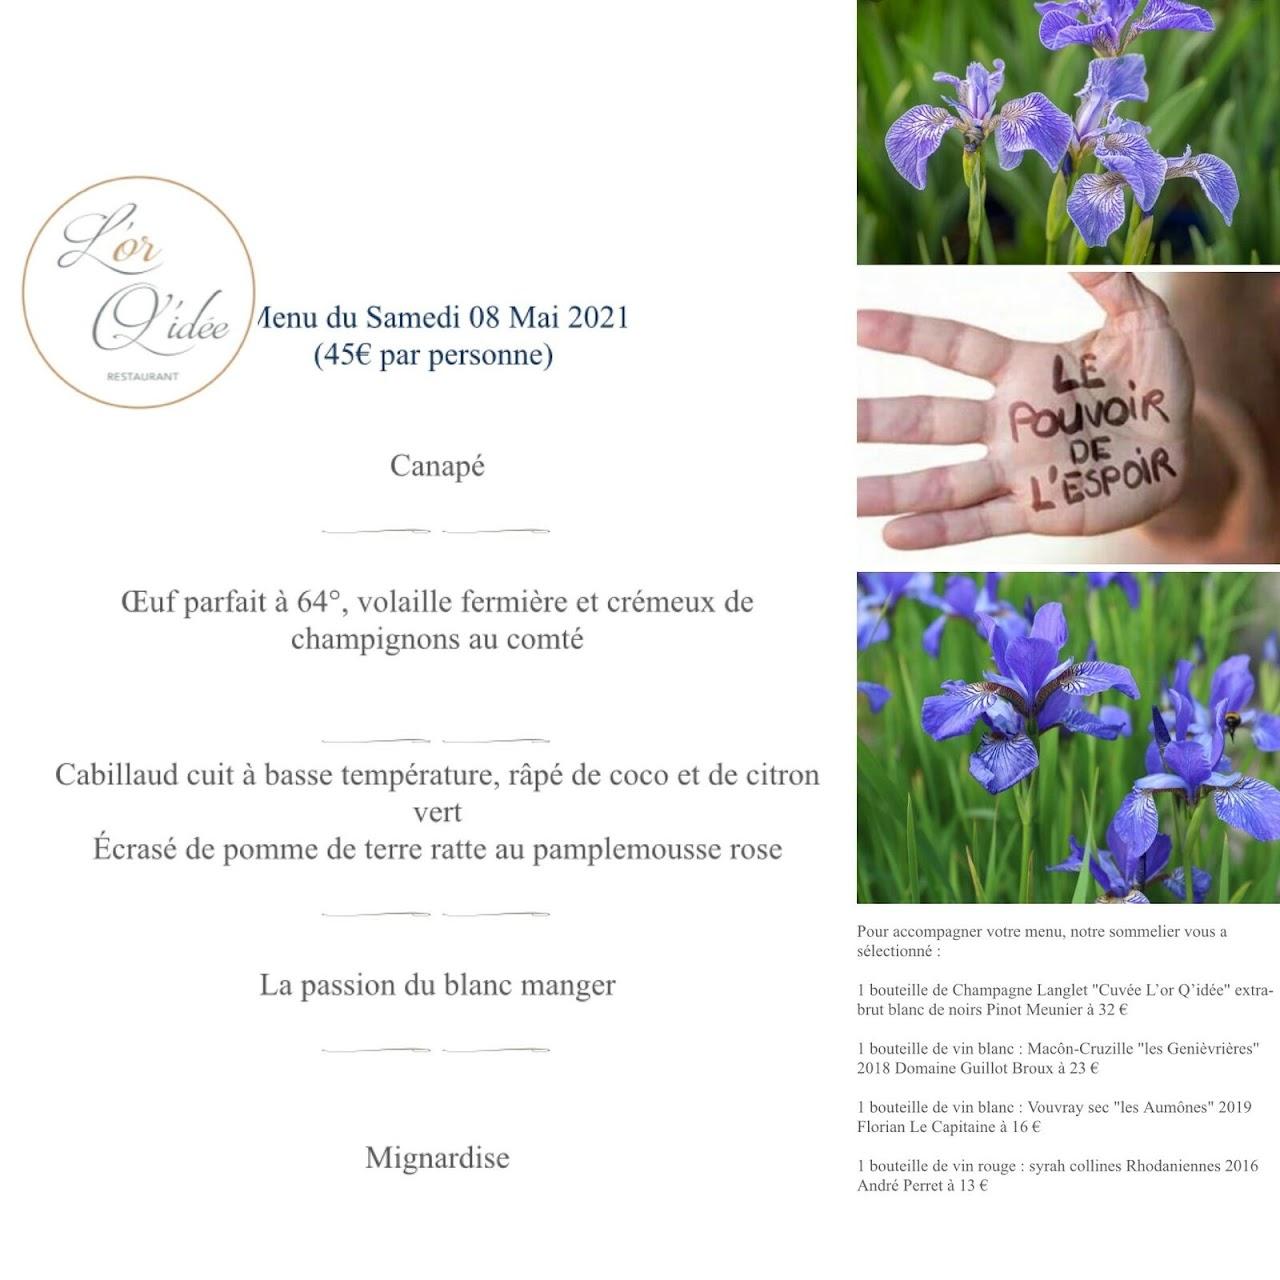 Le menu du 8 mai